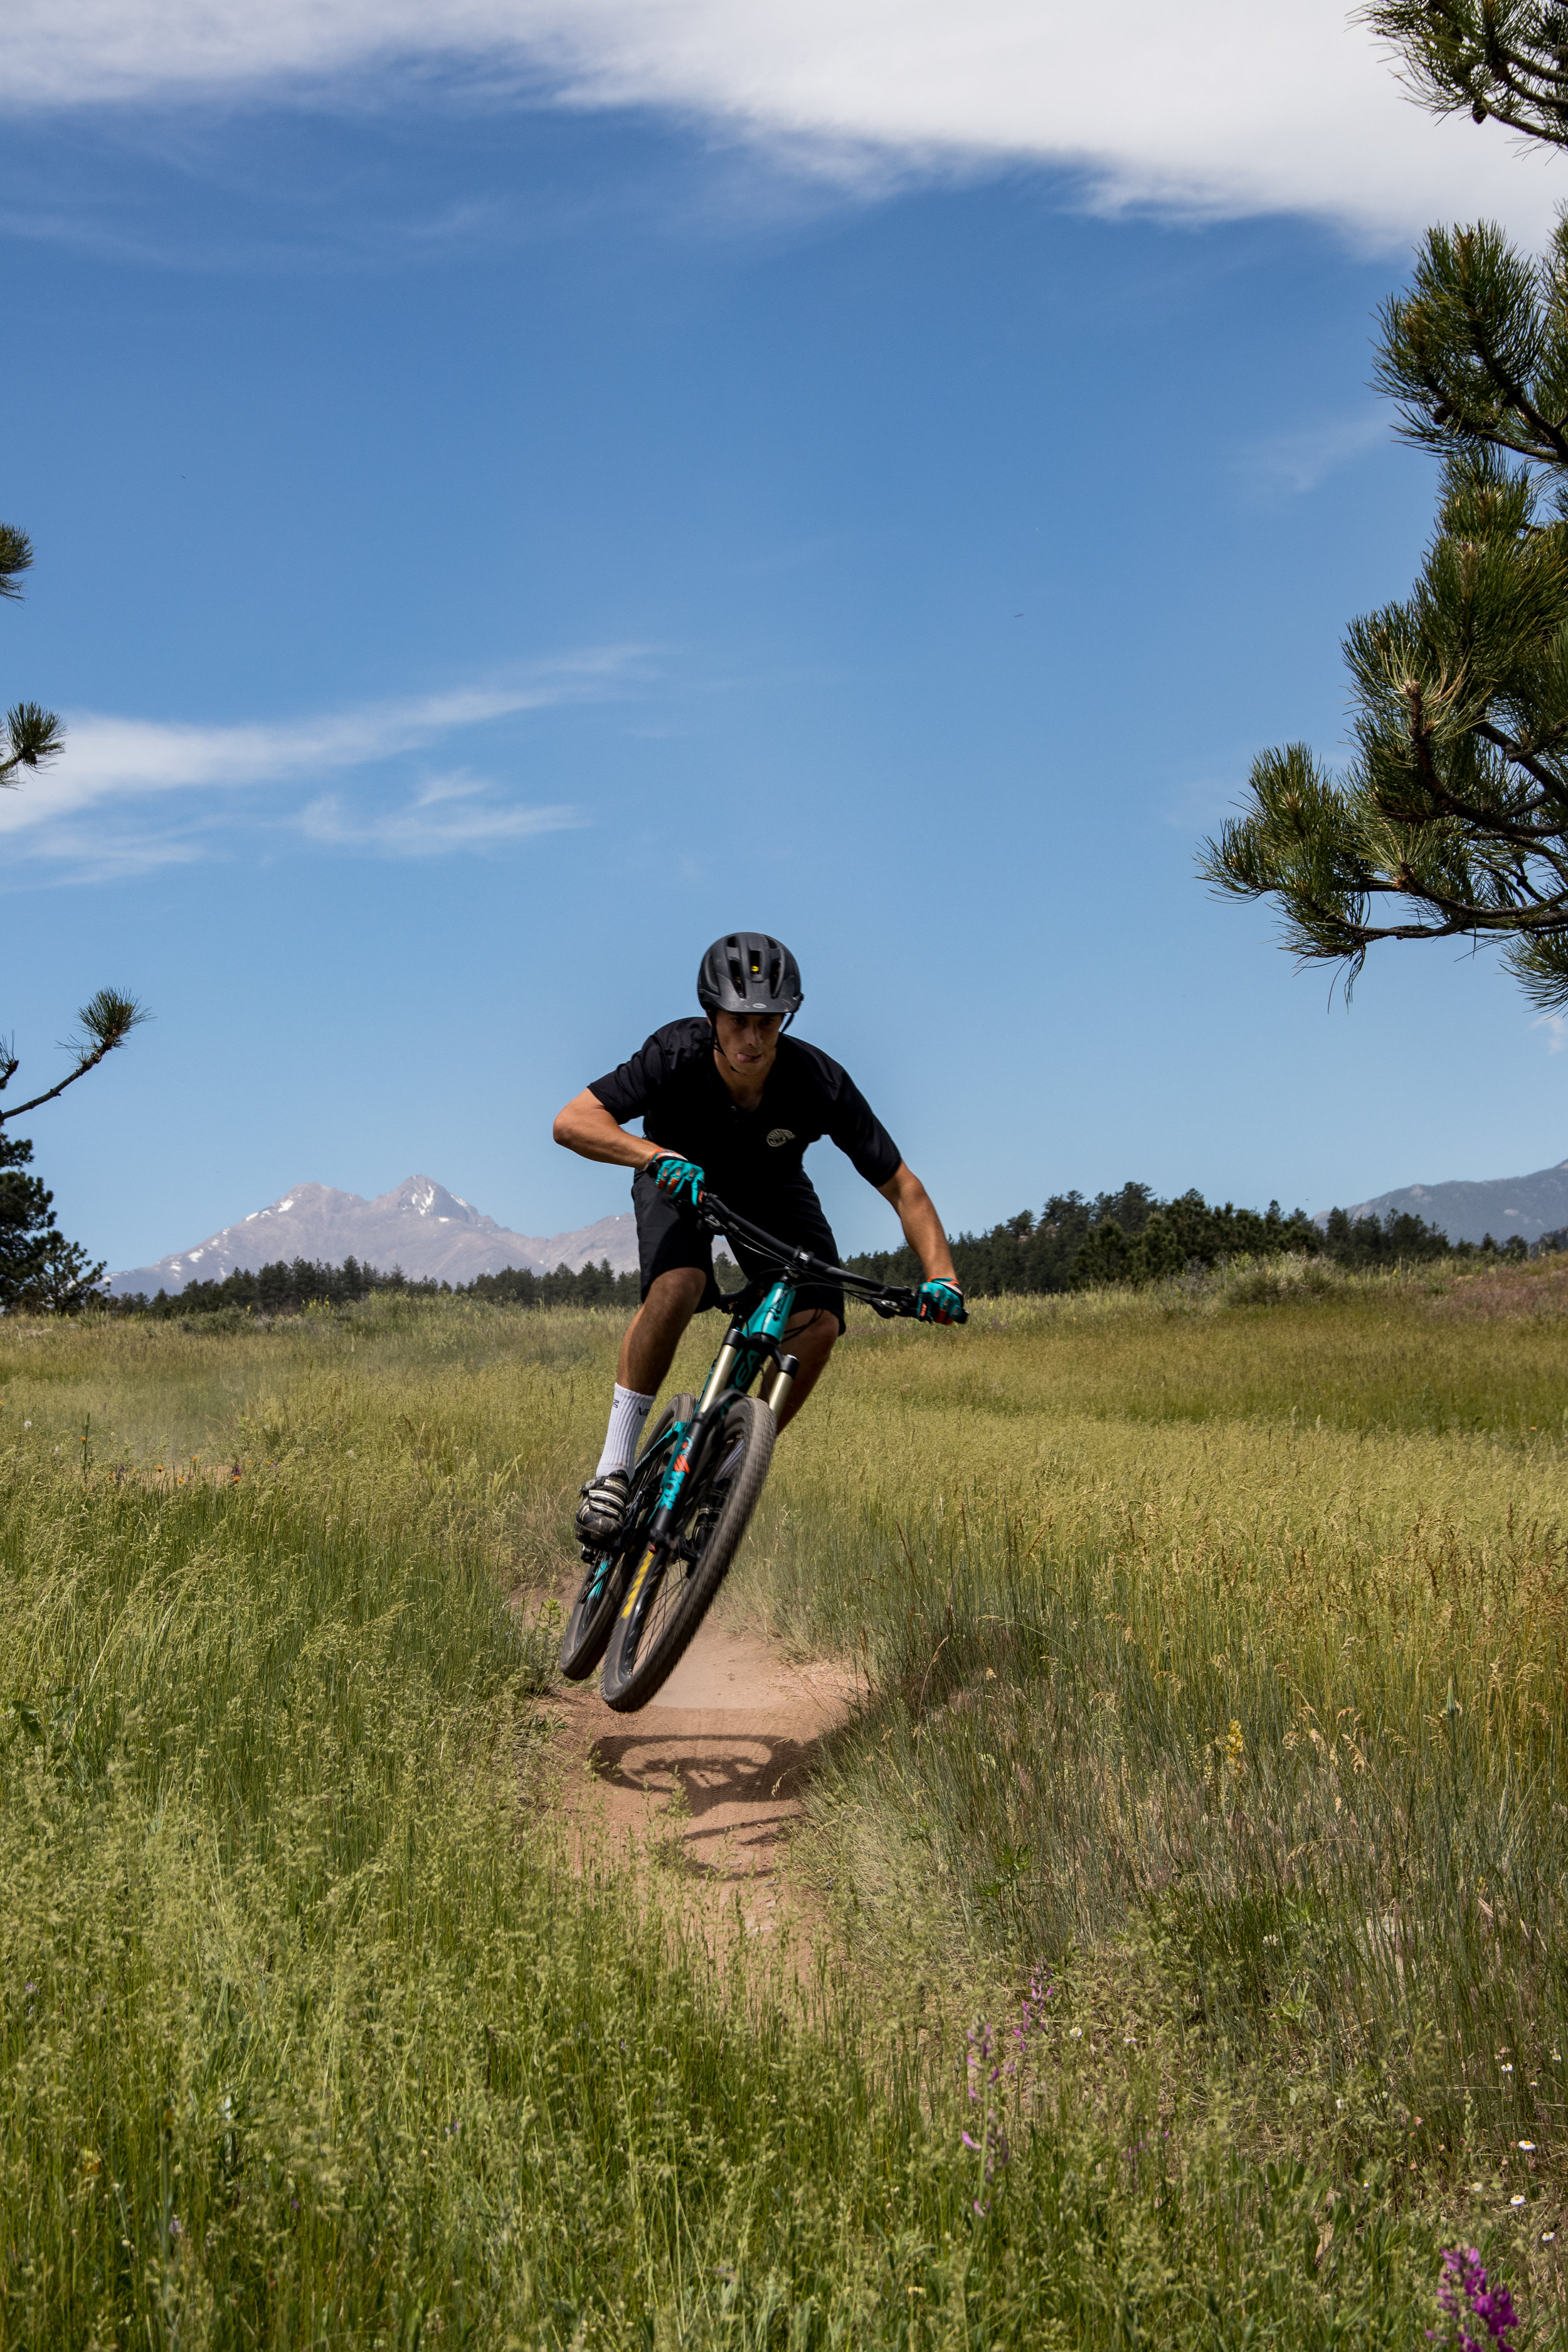 Needless to say, the ride was epic. - Antelope Trail, Boulder, ColoradoPhoto: Landon Kennedy